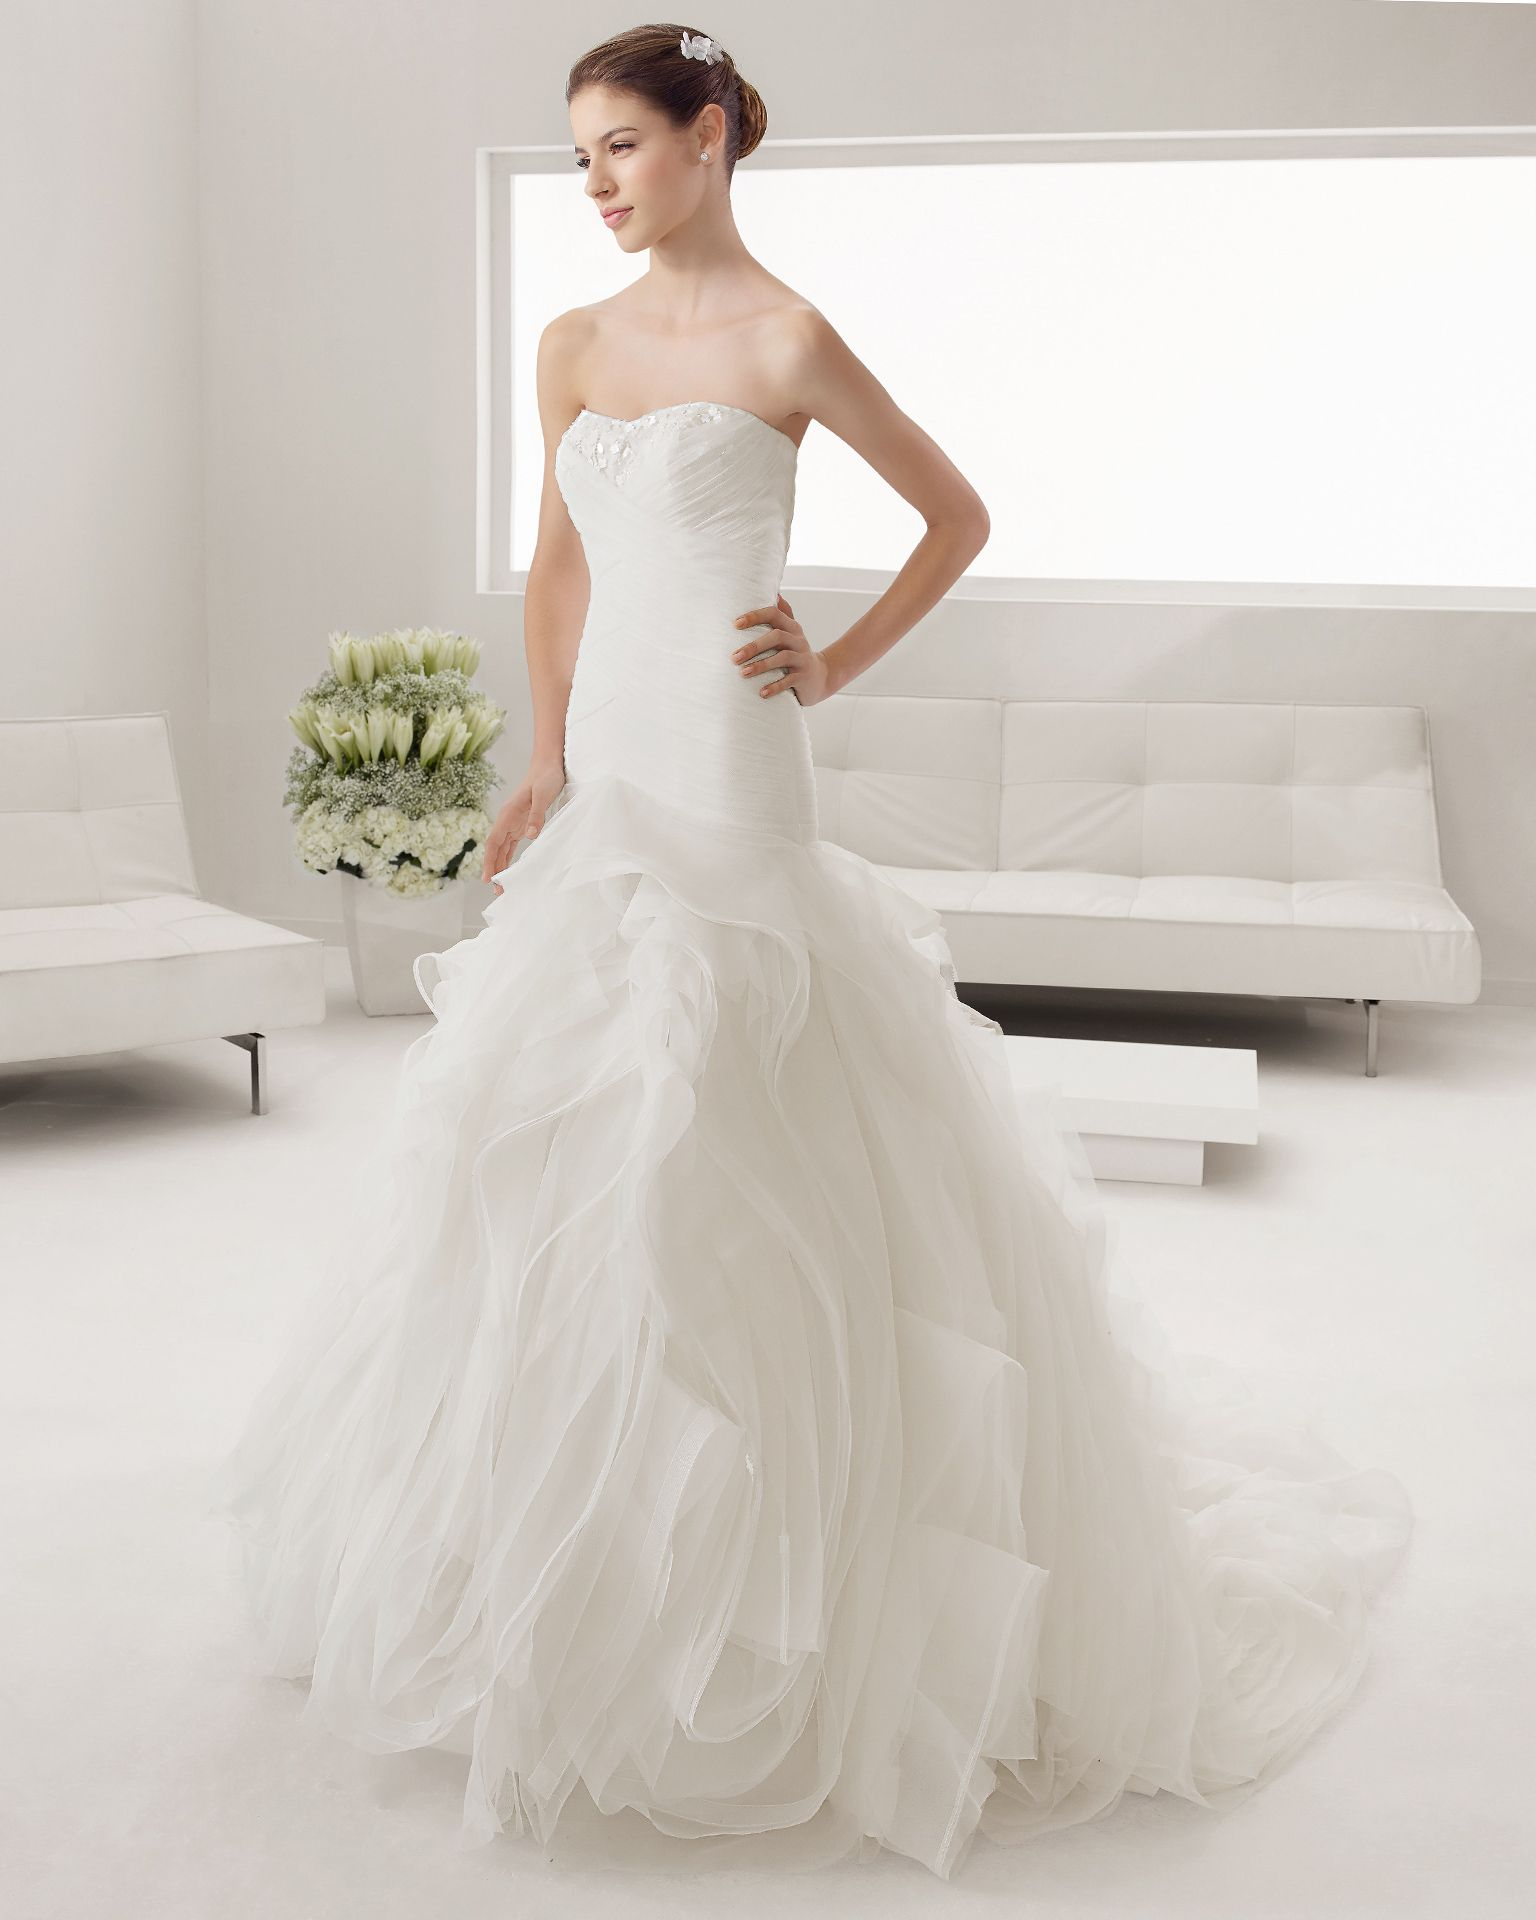 8B182 POMPEYA | Wedding Dresses | 2015 Collection | Alma Novia